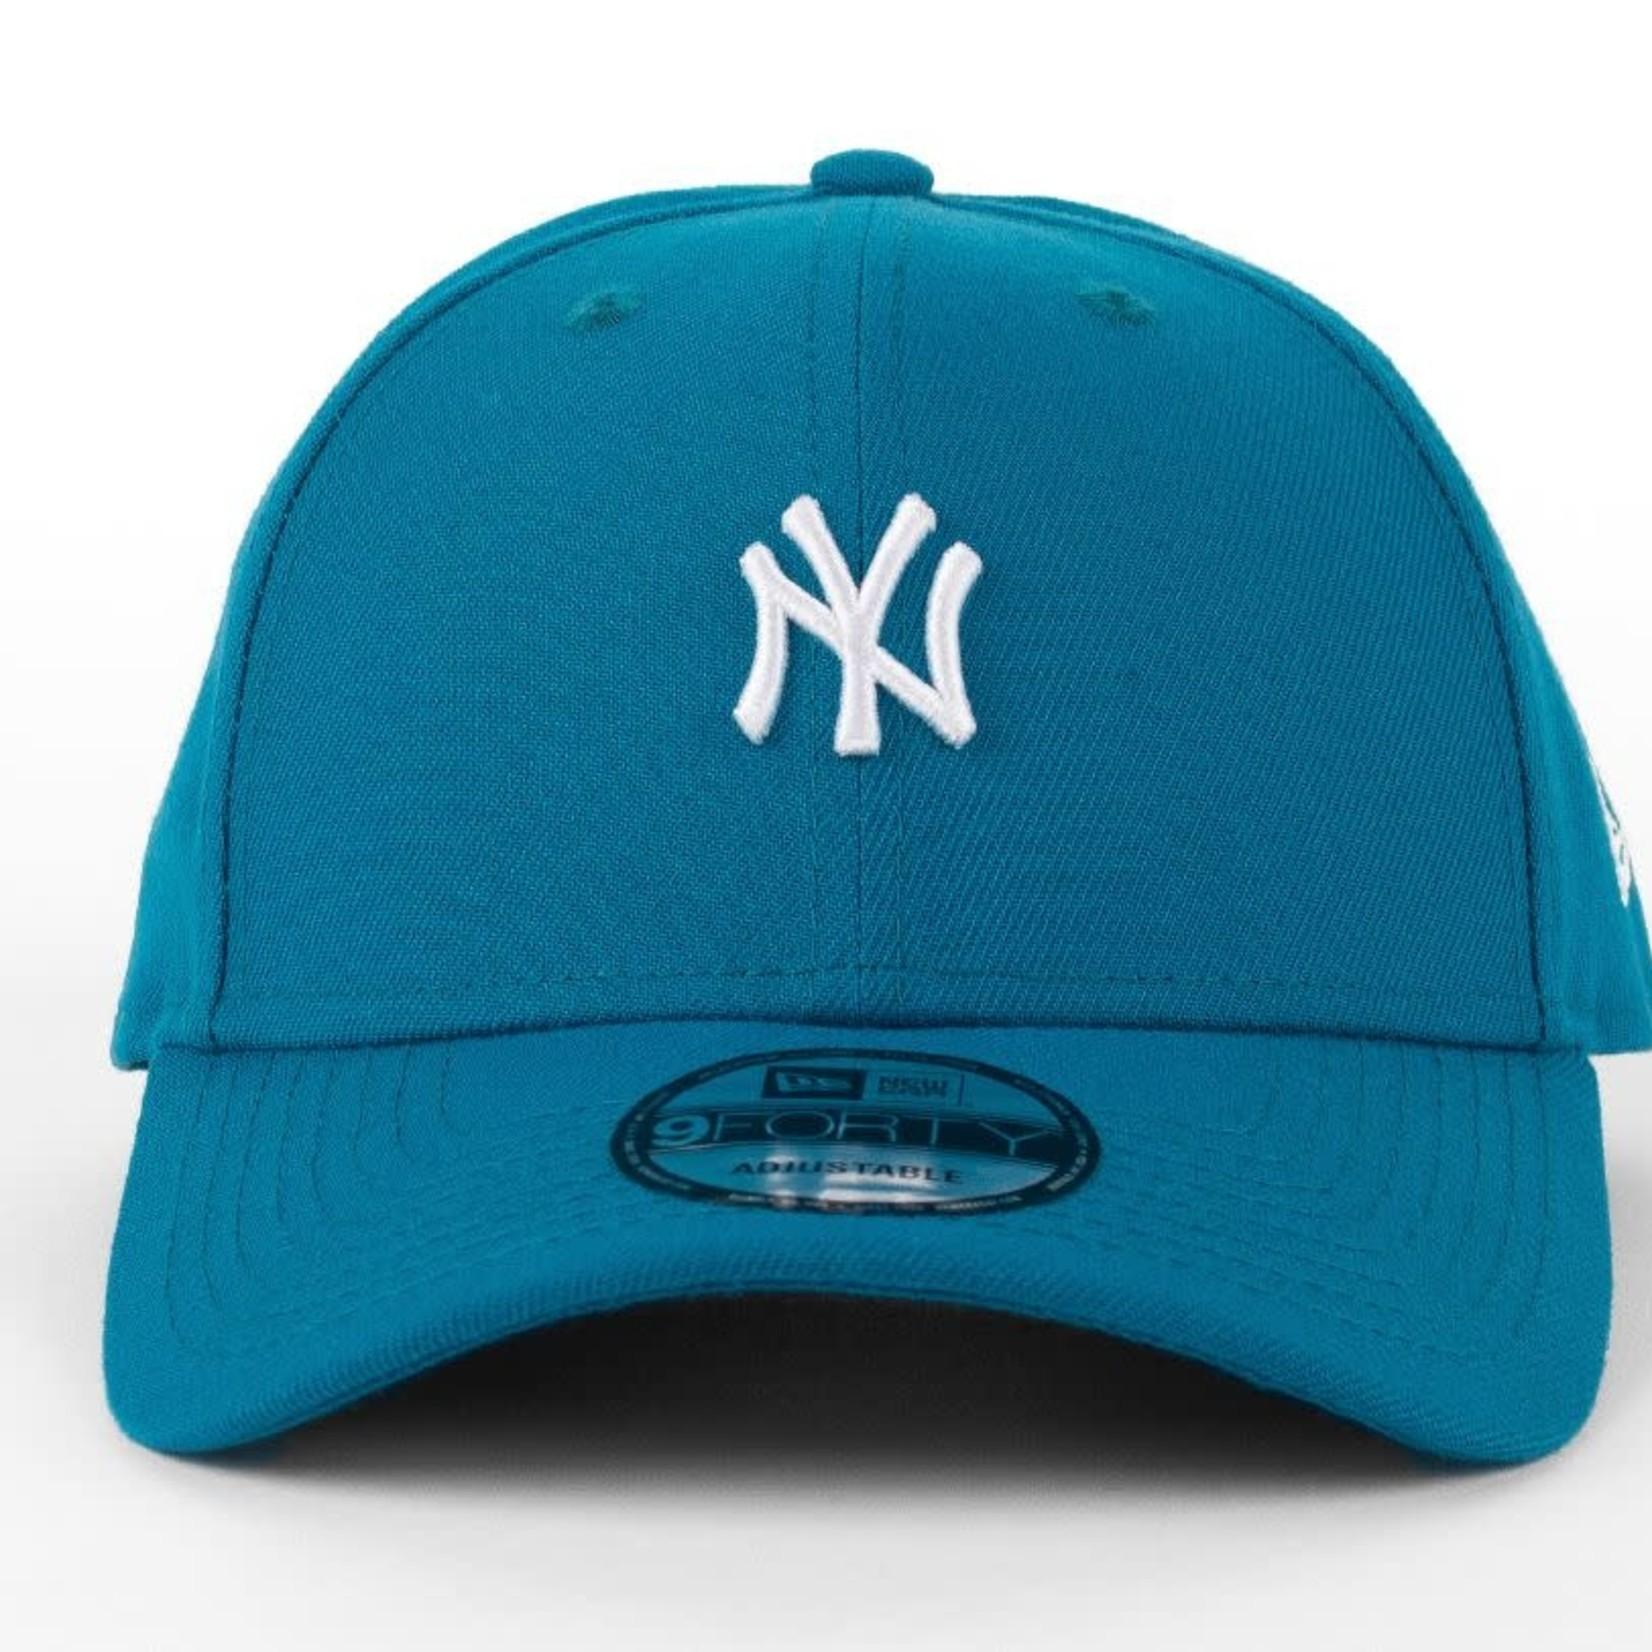 New Era New Era : 940 New-York Yankees Snap Cap